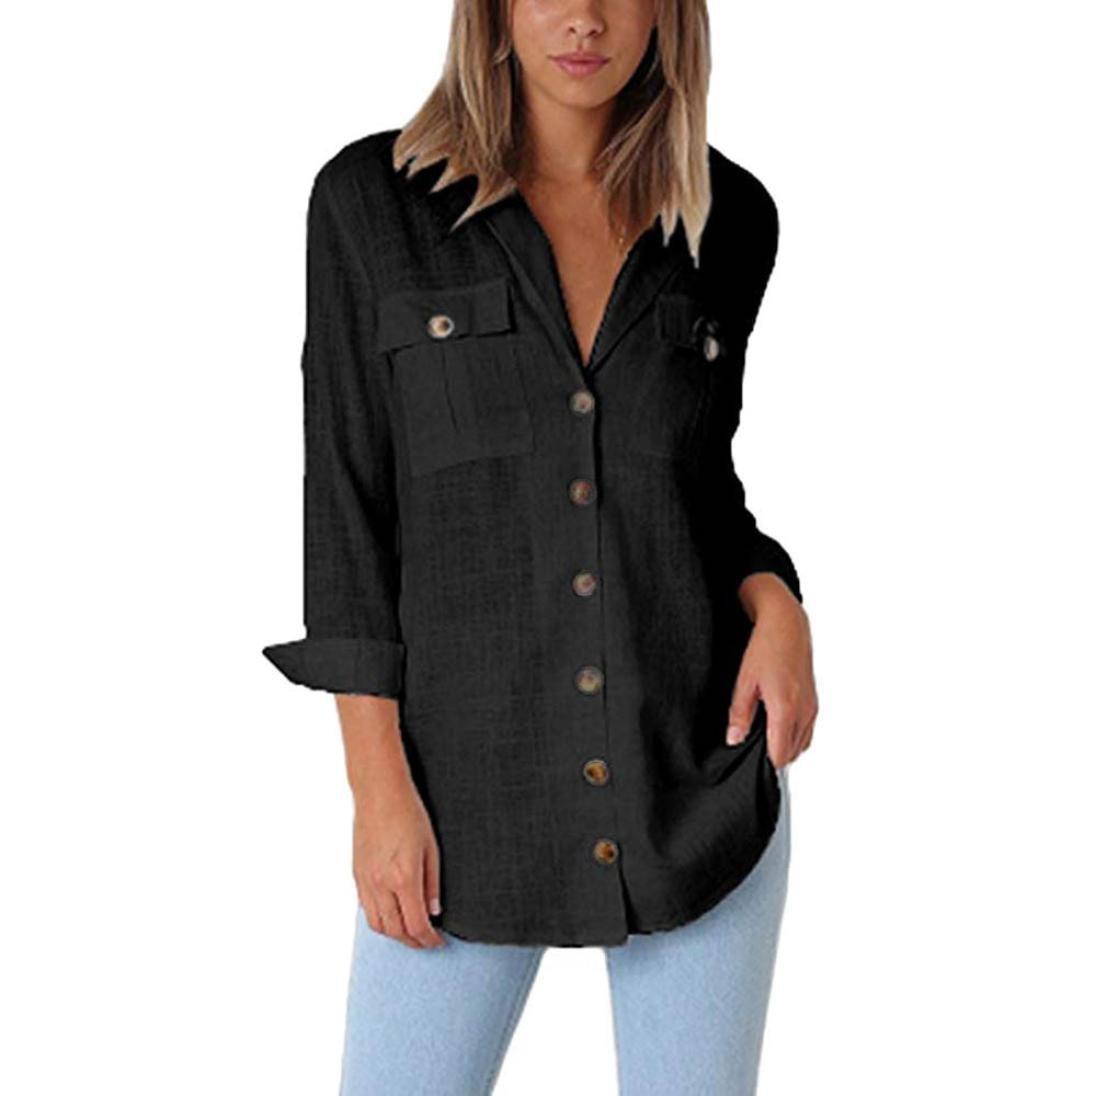 7583384a15da ❊Material:Cotton Blend♥♥Women\'s summer off shoulder blouses long sleeves  sexy tops chiffon ruffles casual t shirt women\'s v neck ruched sleeveless  sexy ...